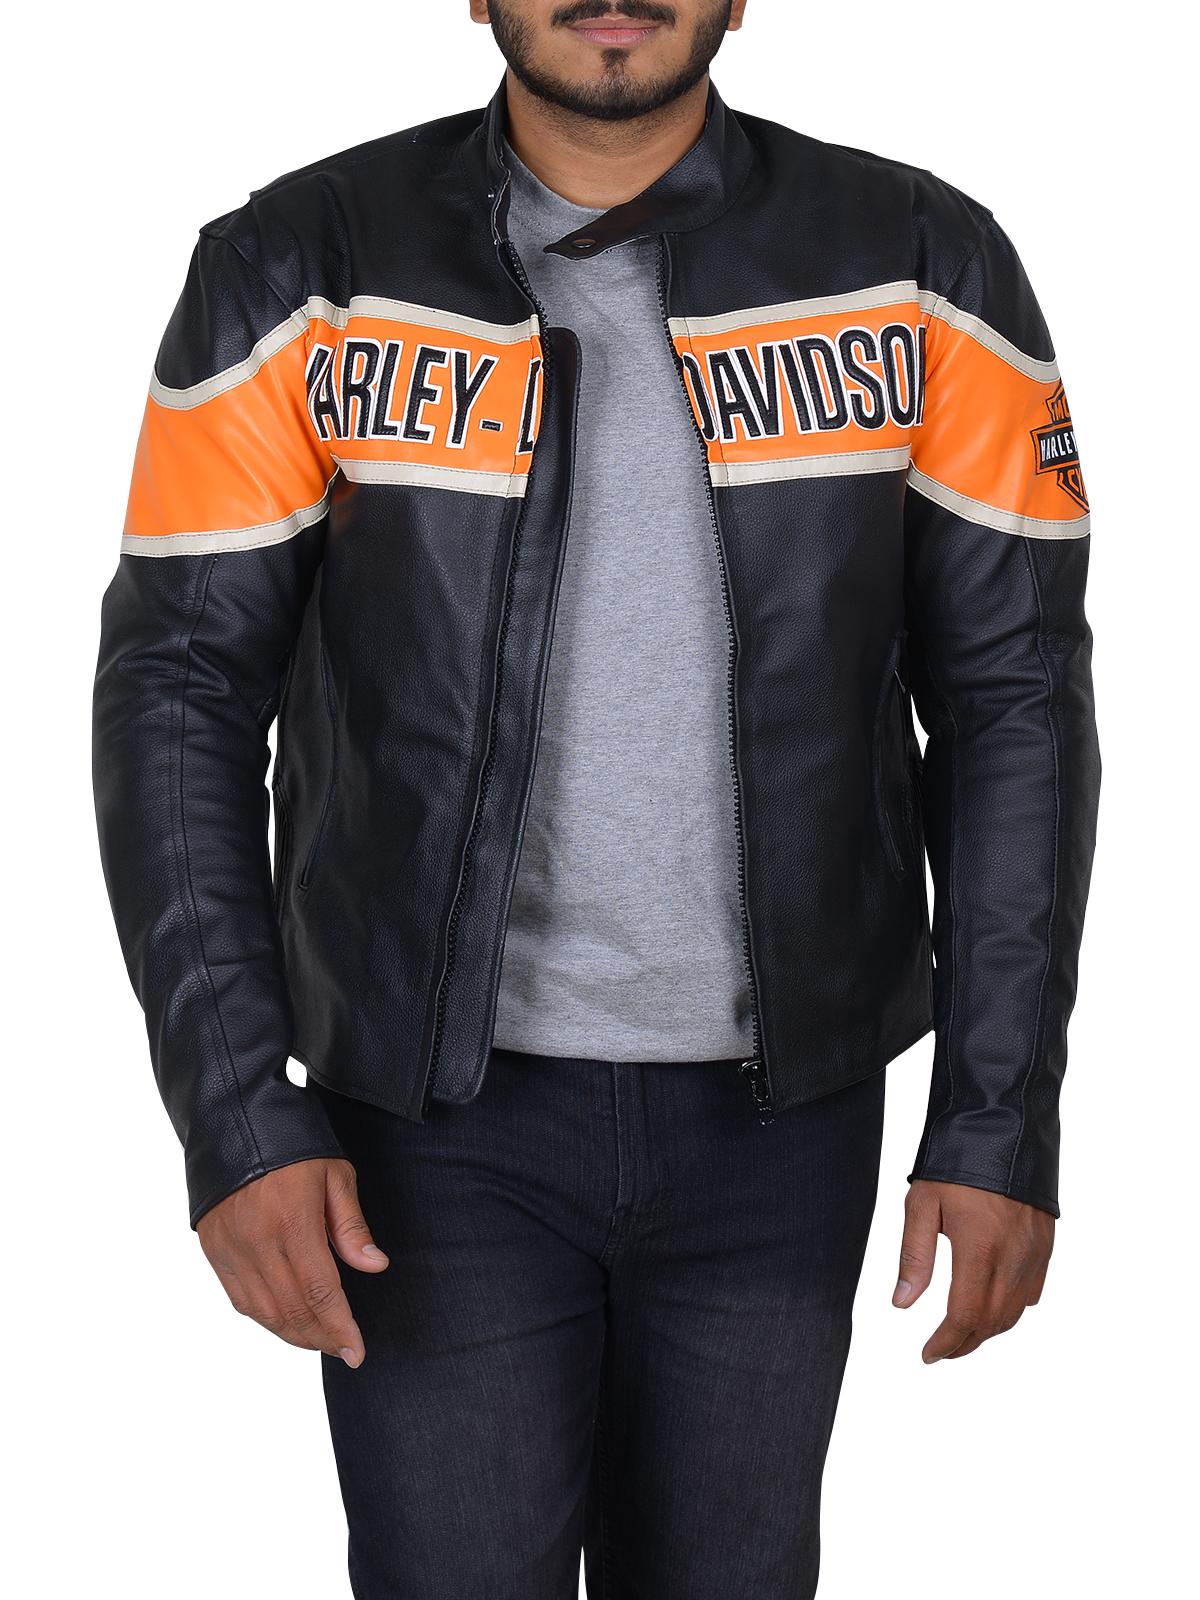 Dashing Black Biker Leather Jacket   Men's Jacket   MauveTree